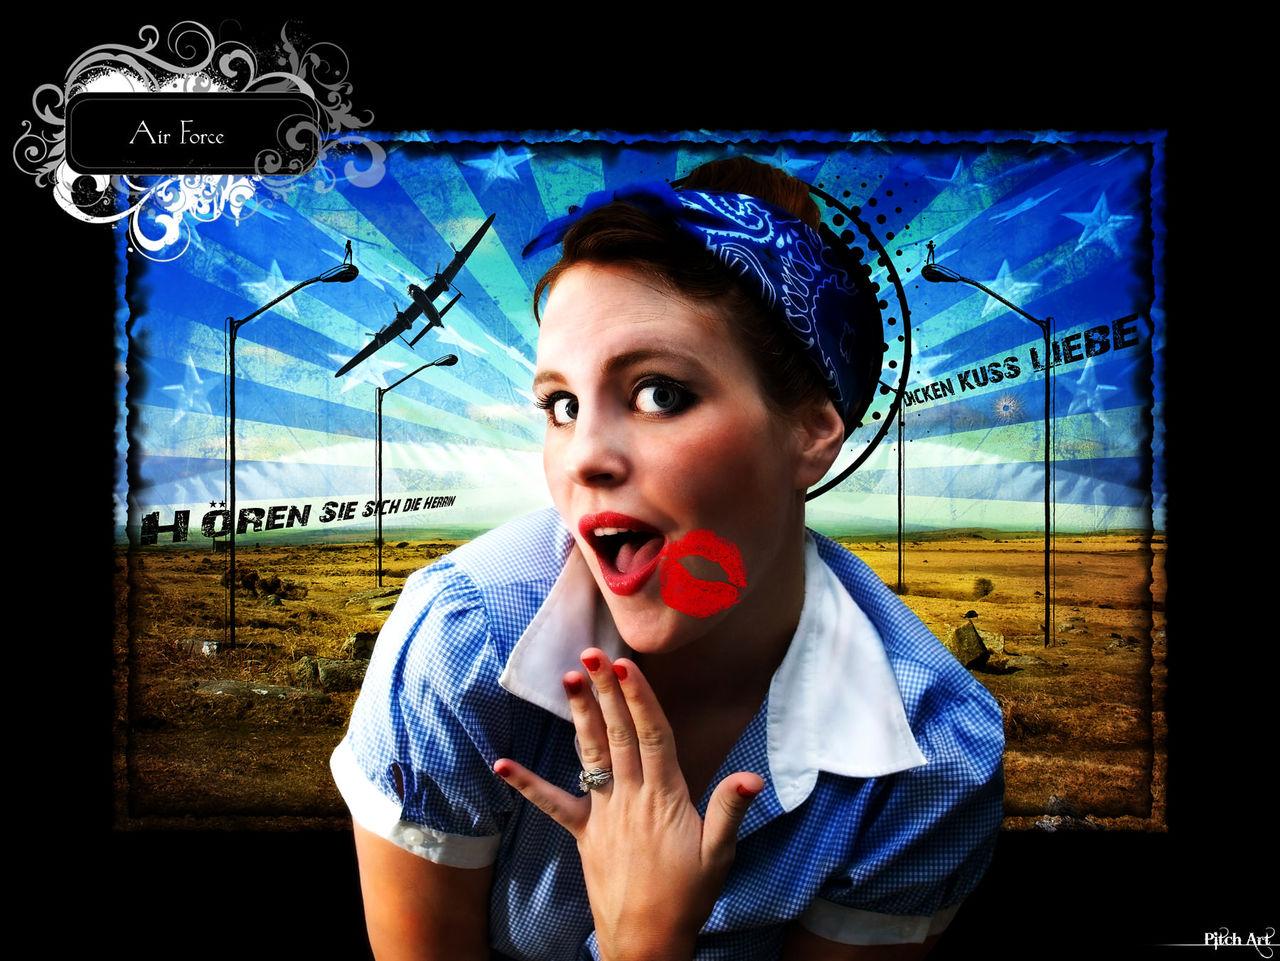 Studio Pitch Art Air Force ''Color''